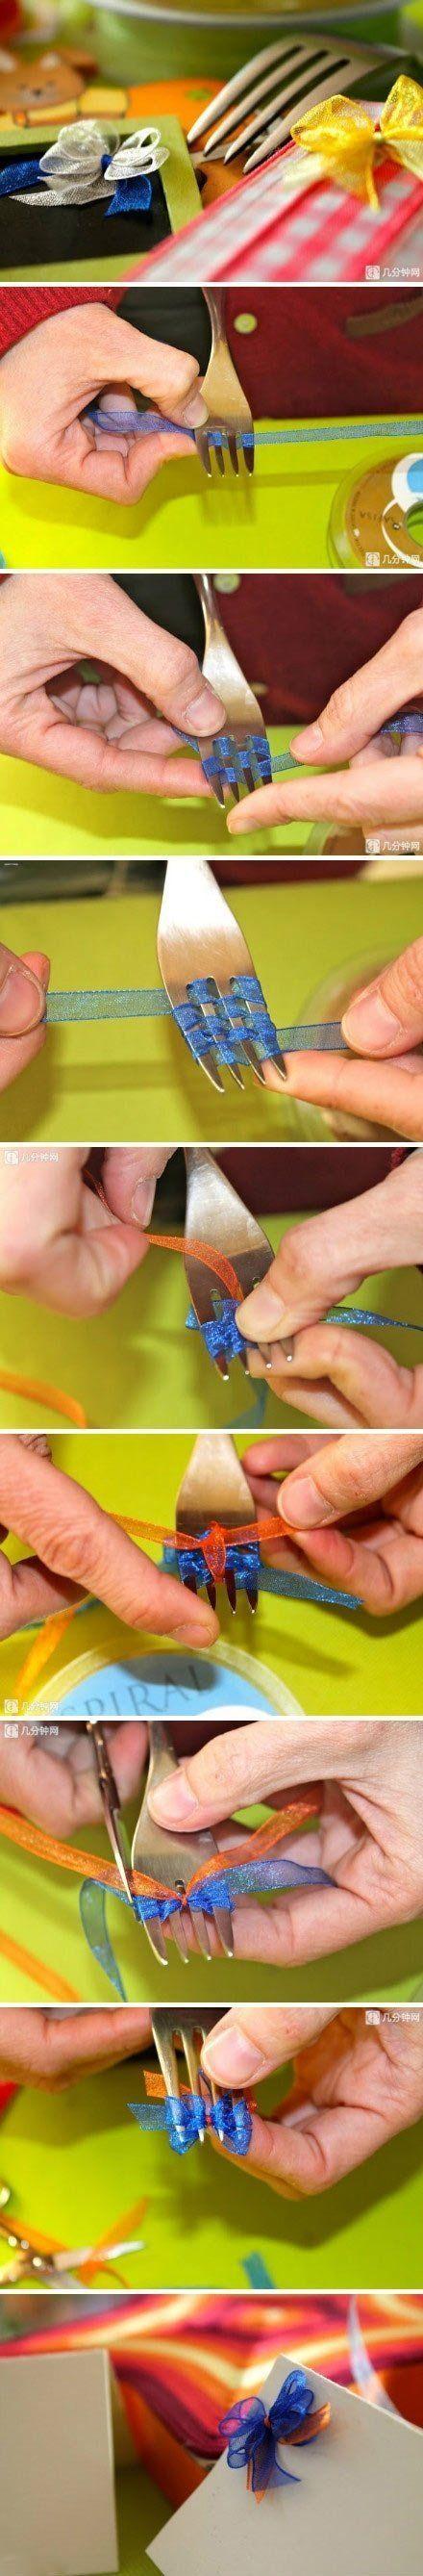 How to make tiny bows      #DIY #crafty